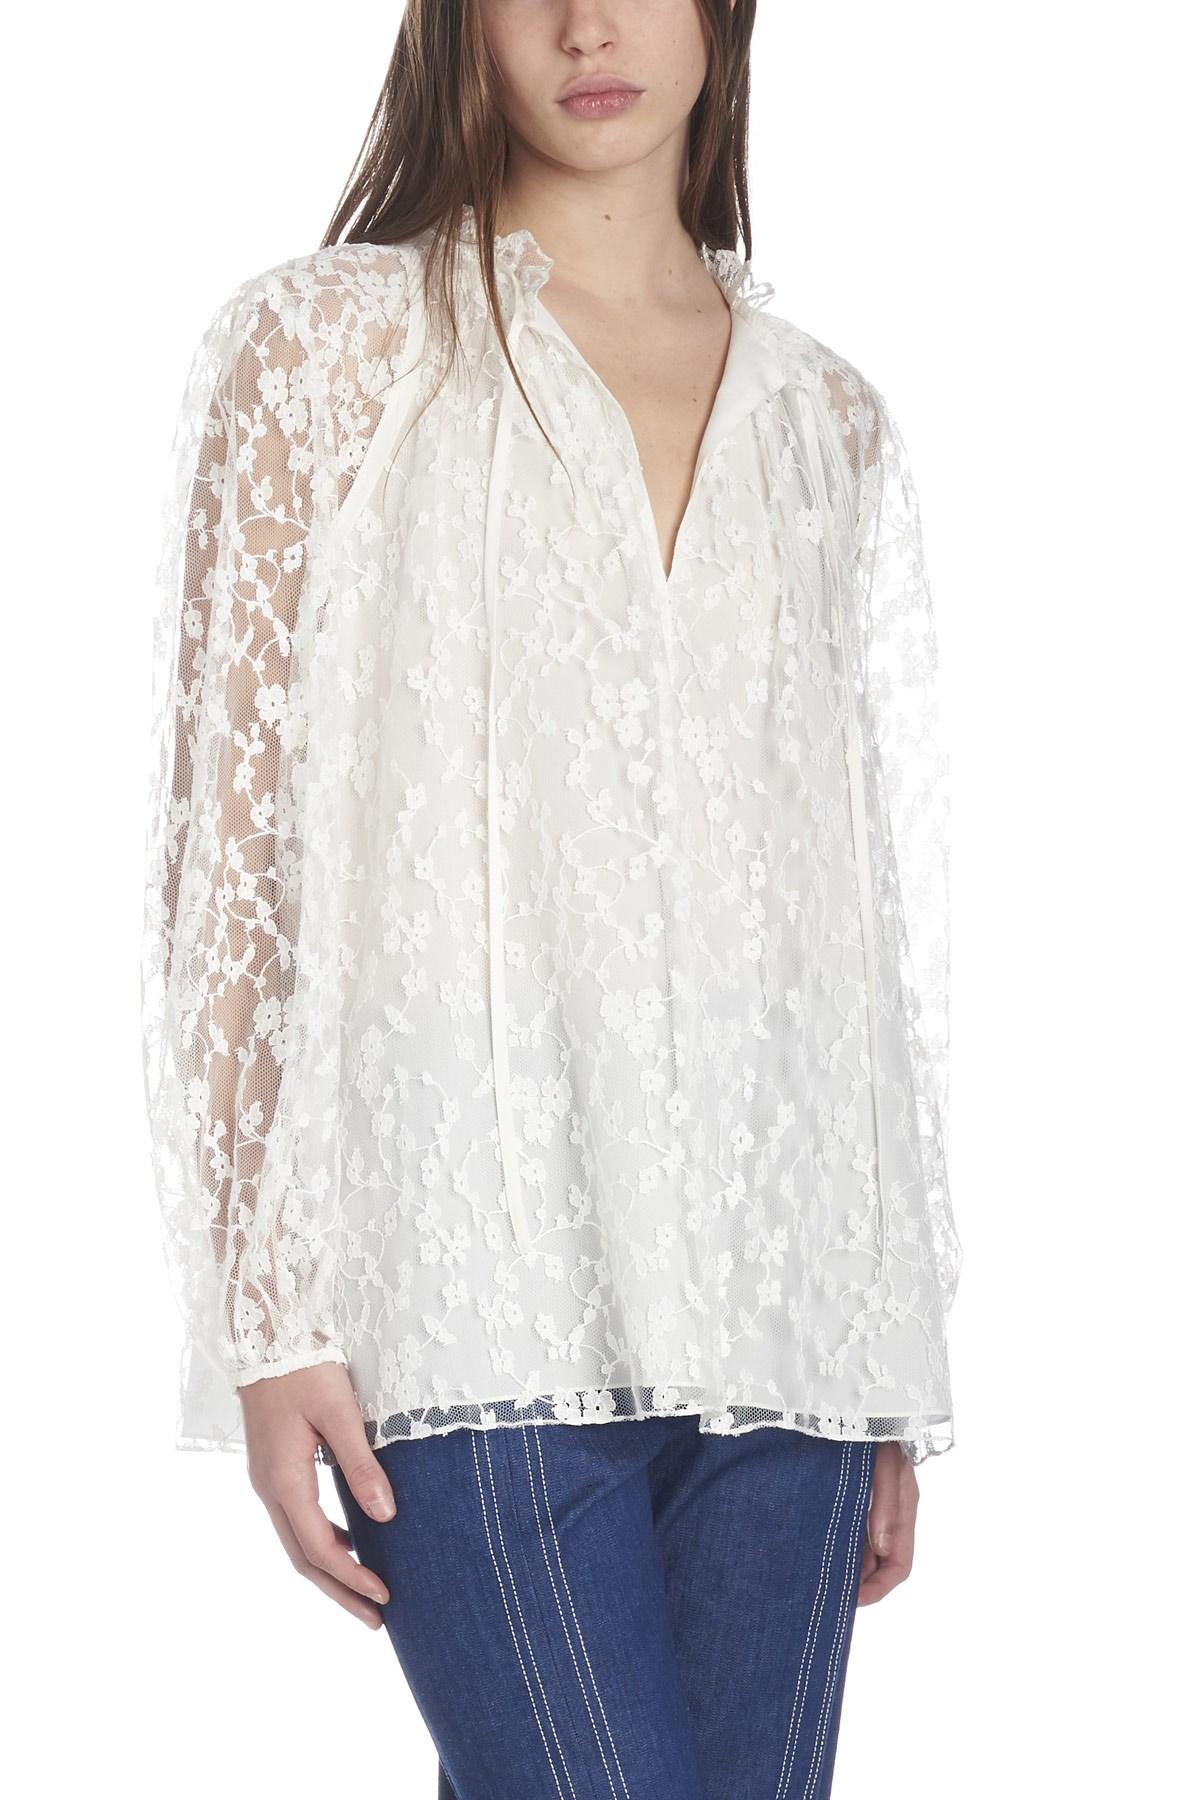 3a1841a1677ed4 chloé lace blouse available on julian-fashion.com - 62748